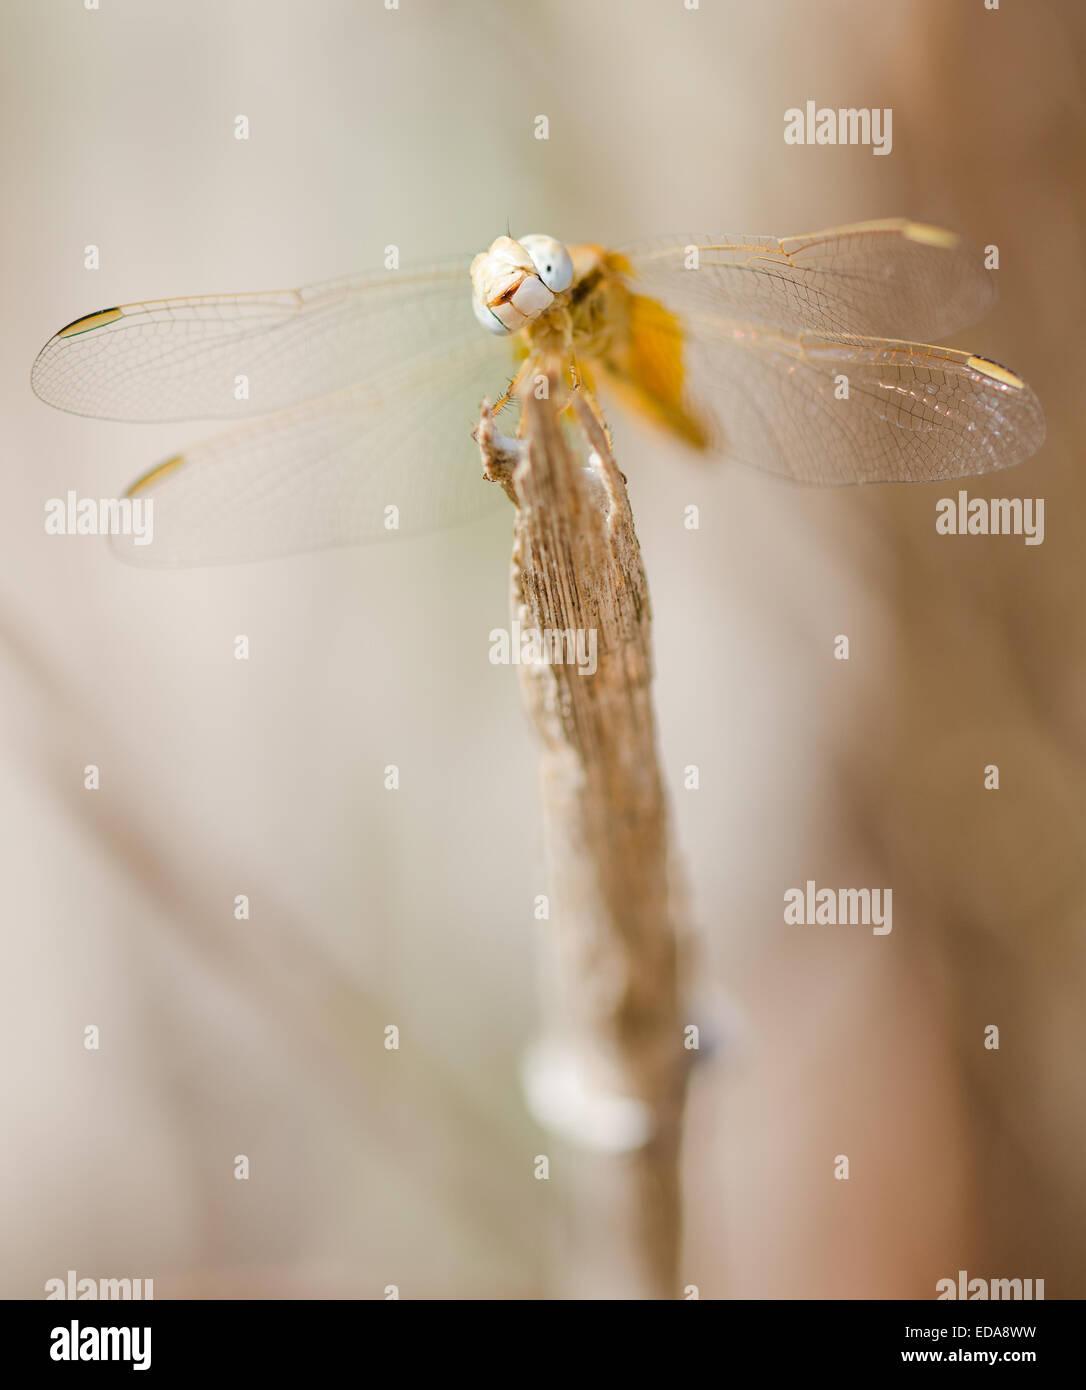 Female Scarlet darter dragonfly (Crocothemis erythraea) resting on a stick Stock Photo